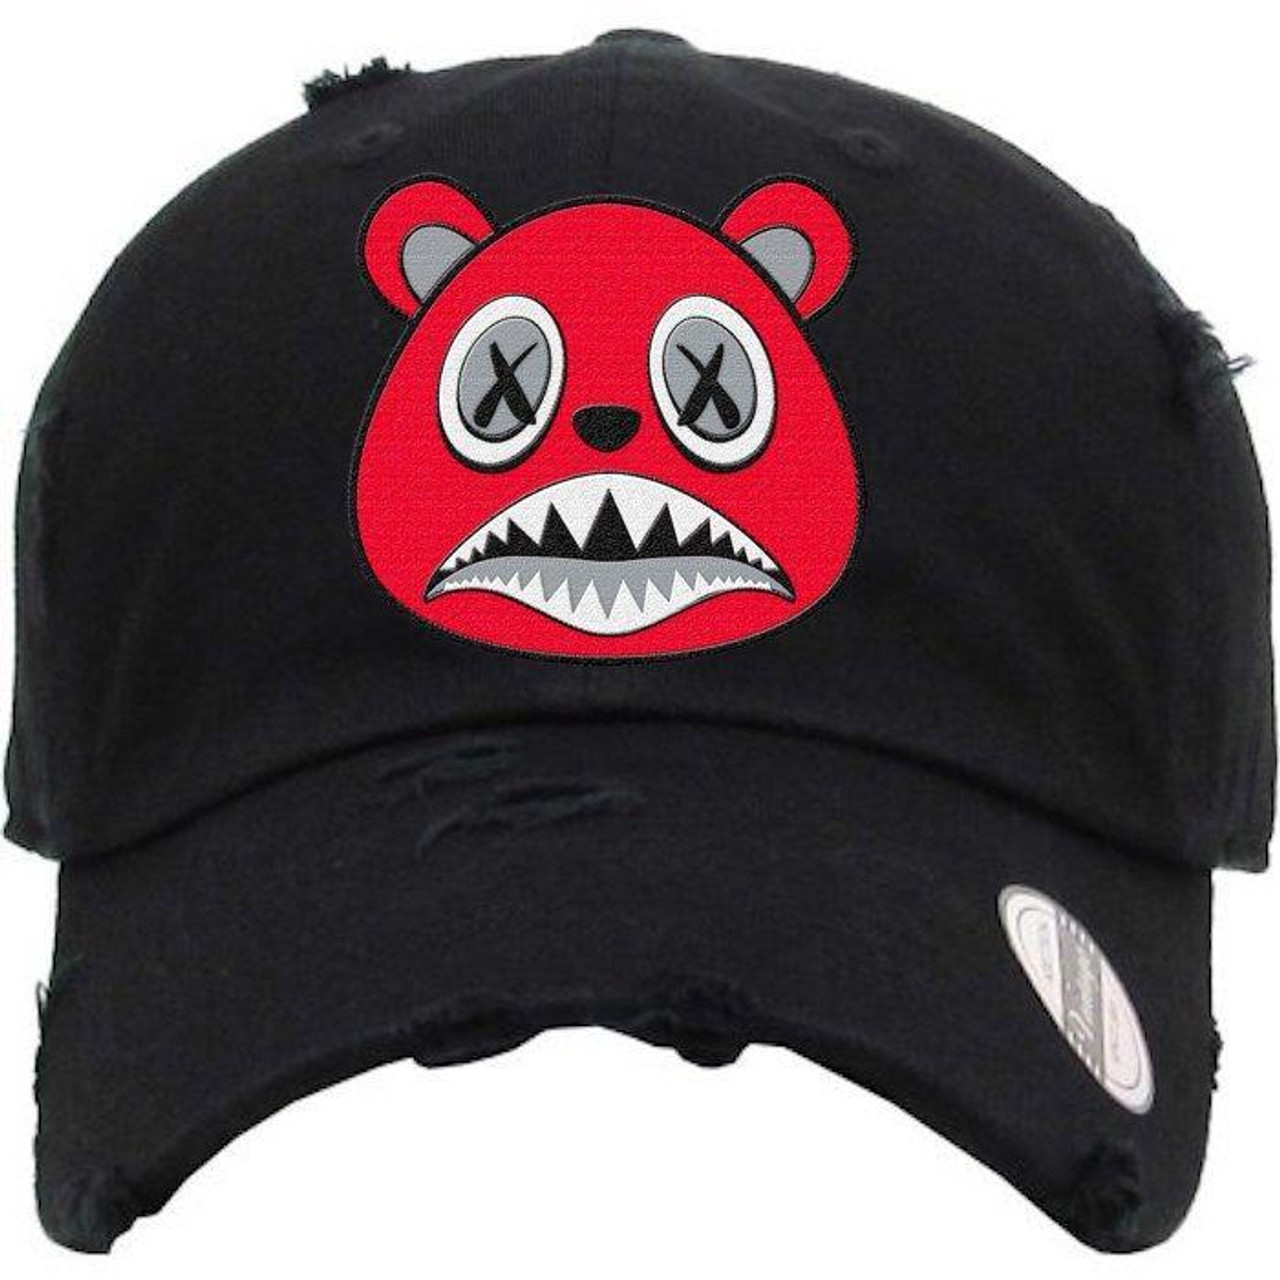 00fb067b BAWS Bear Red Logo Black Dad Hat - KCT Streetwear - OFFICAL NZ ...